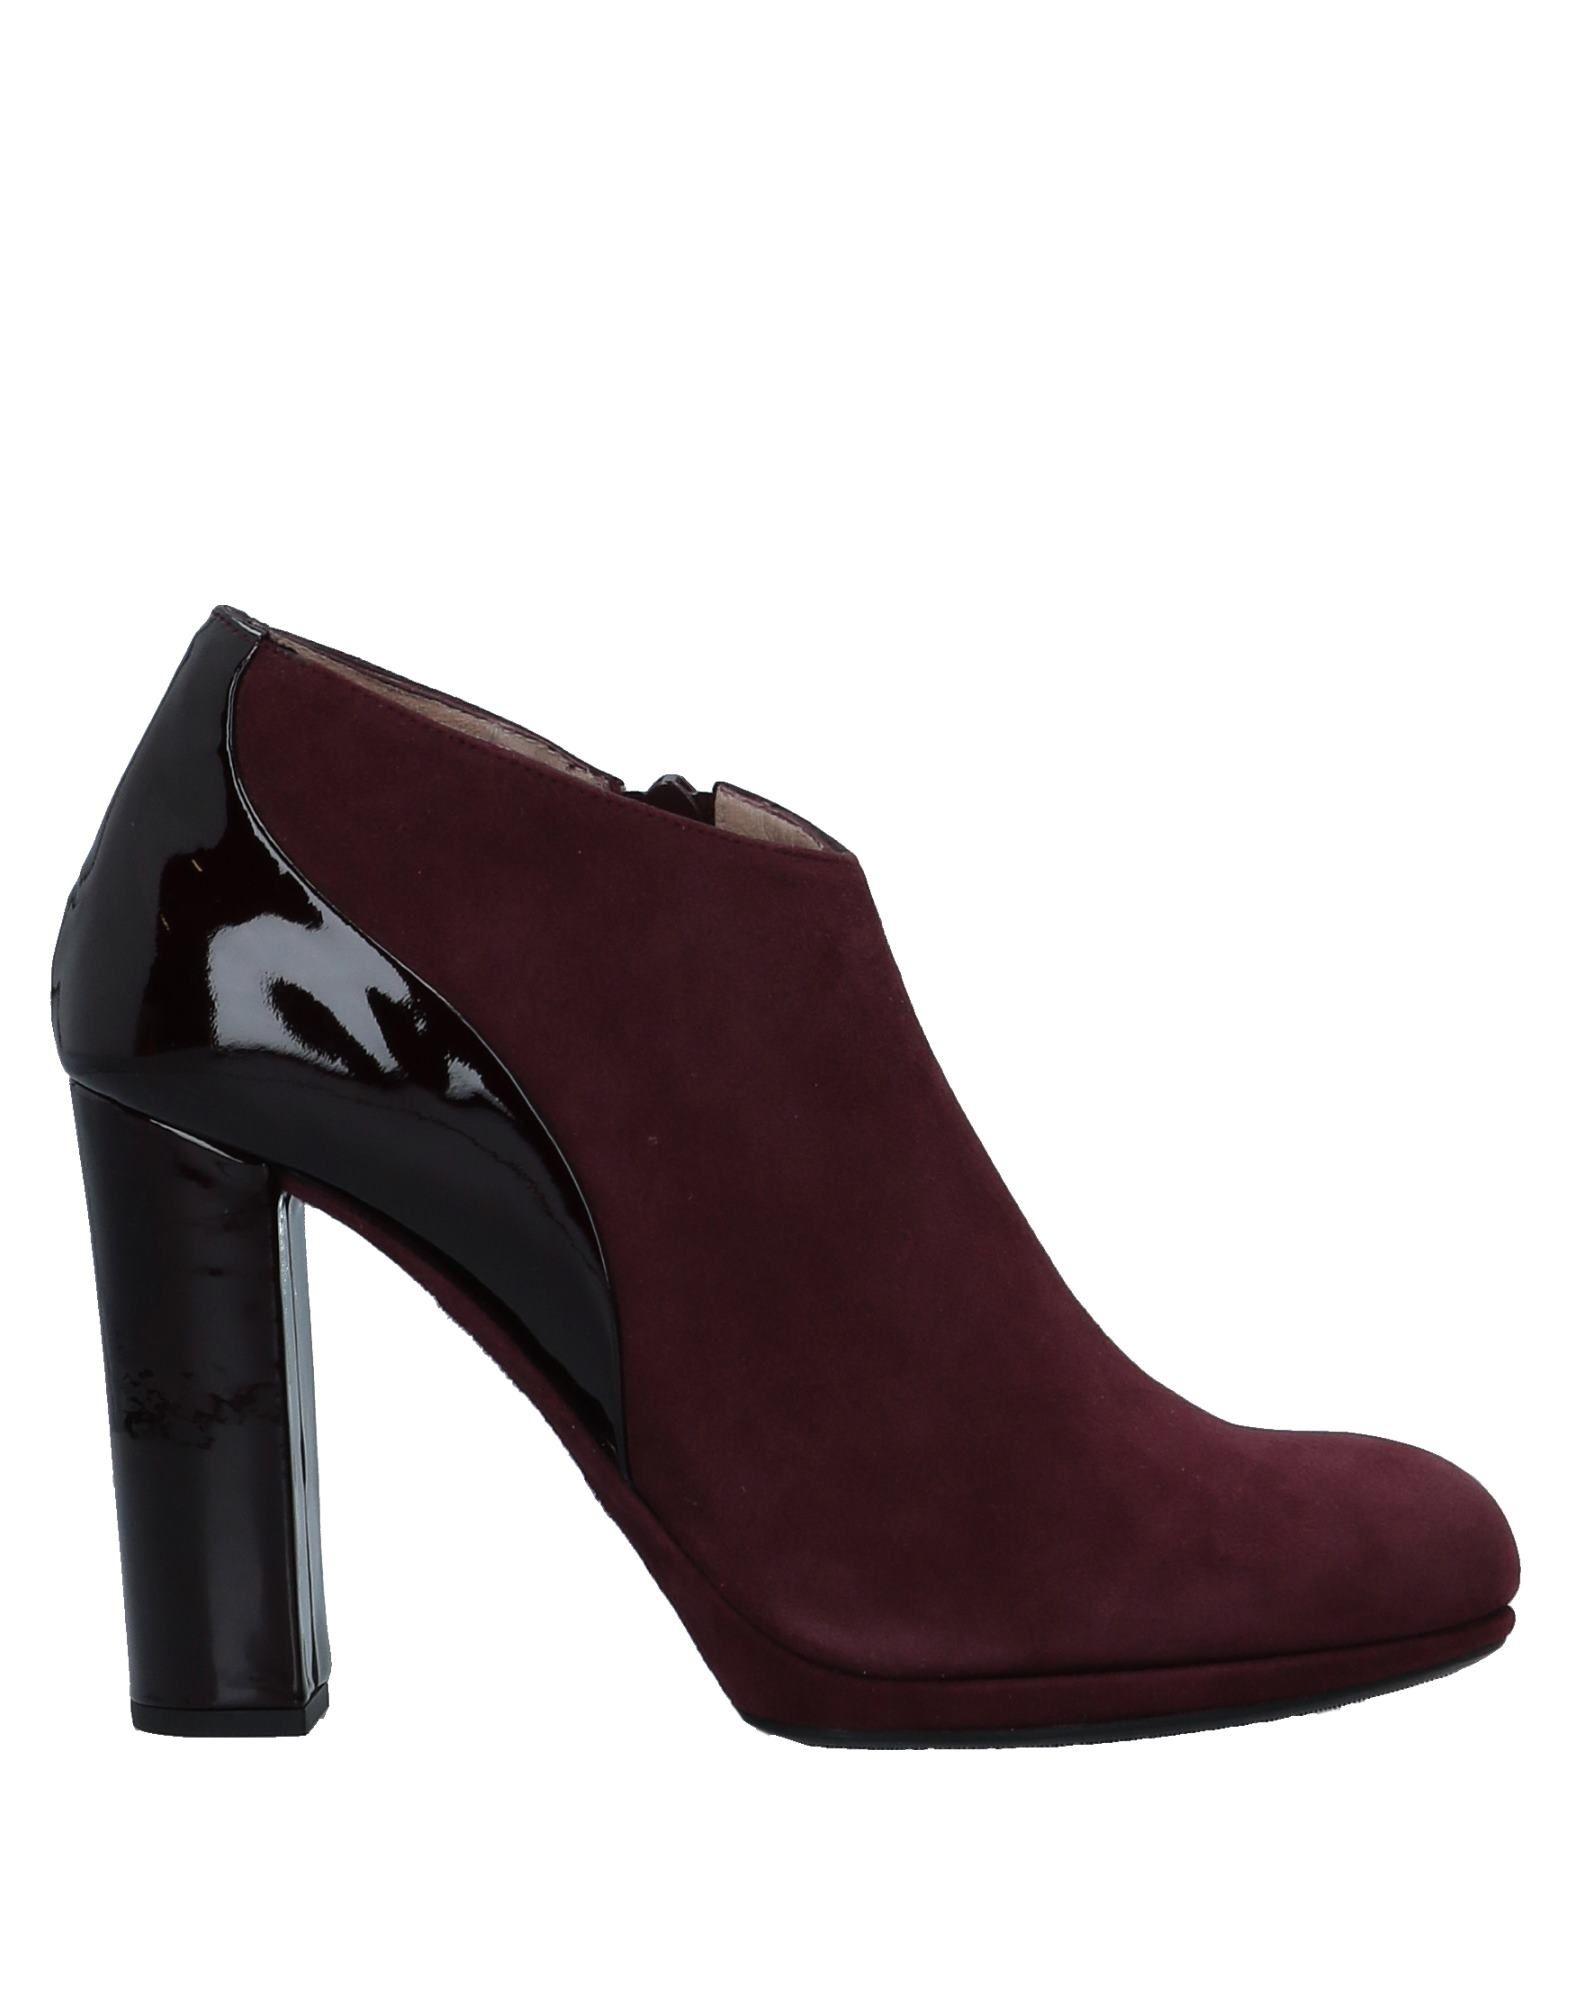 UNISA Ankle Boot in Deep Purple